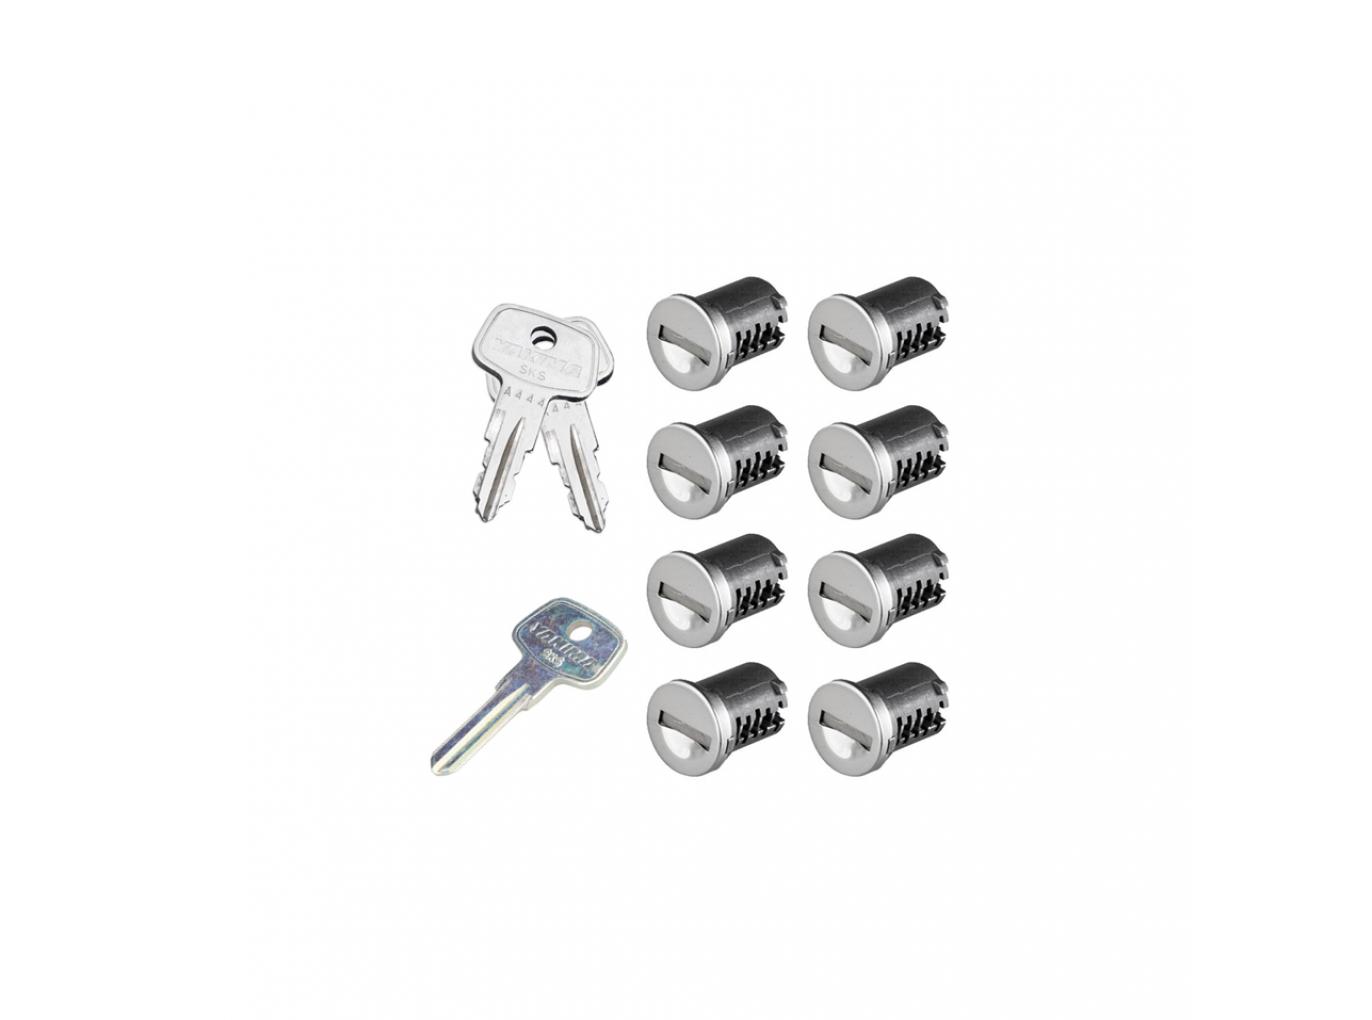 Yakima SKS lock cylinders lock cores 2 lock cores 1 key